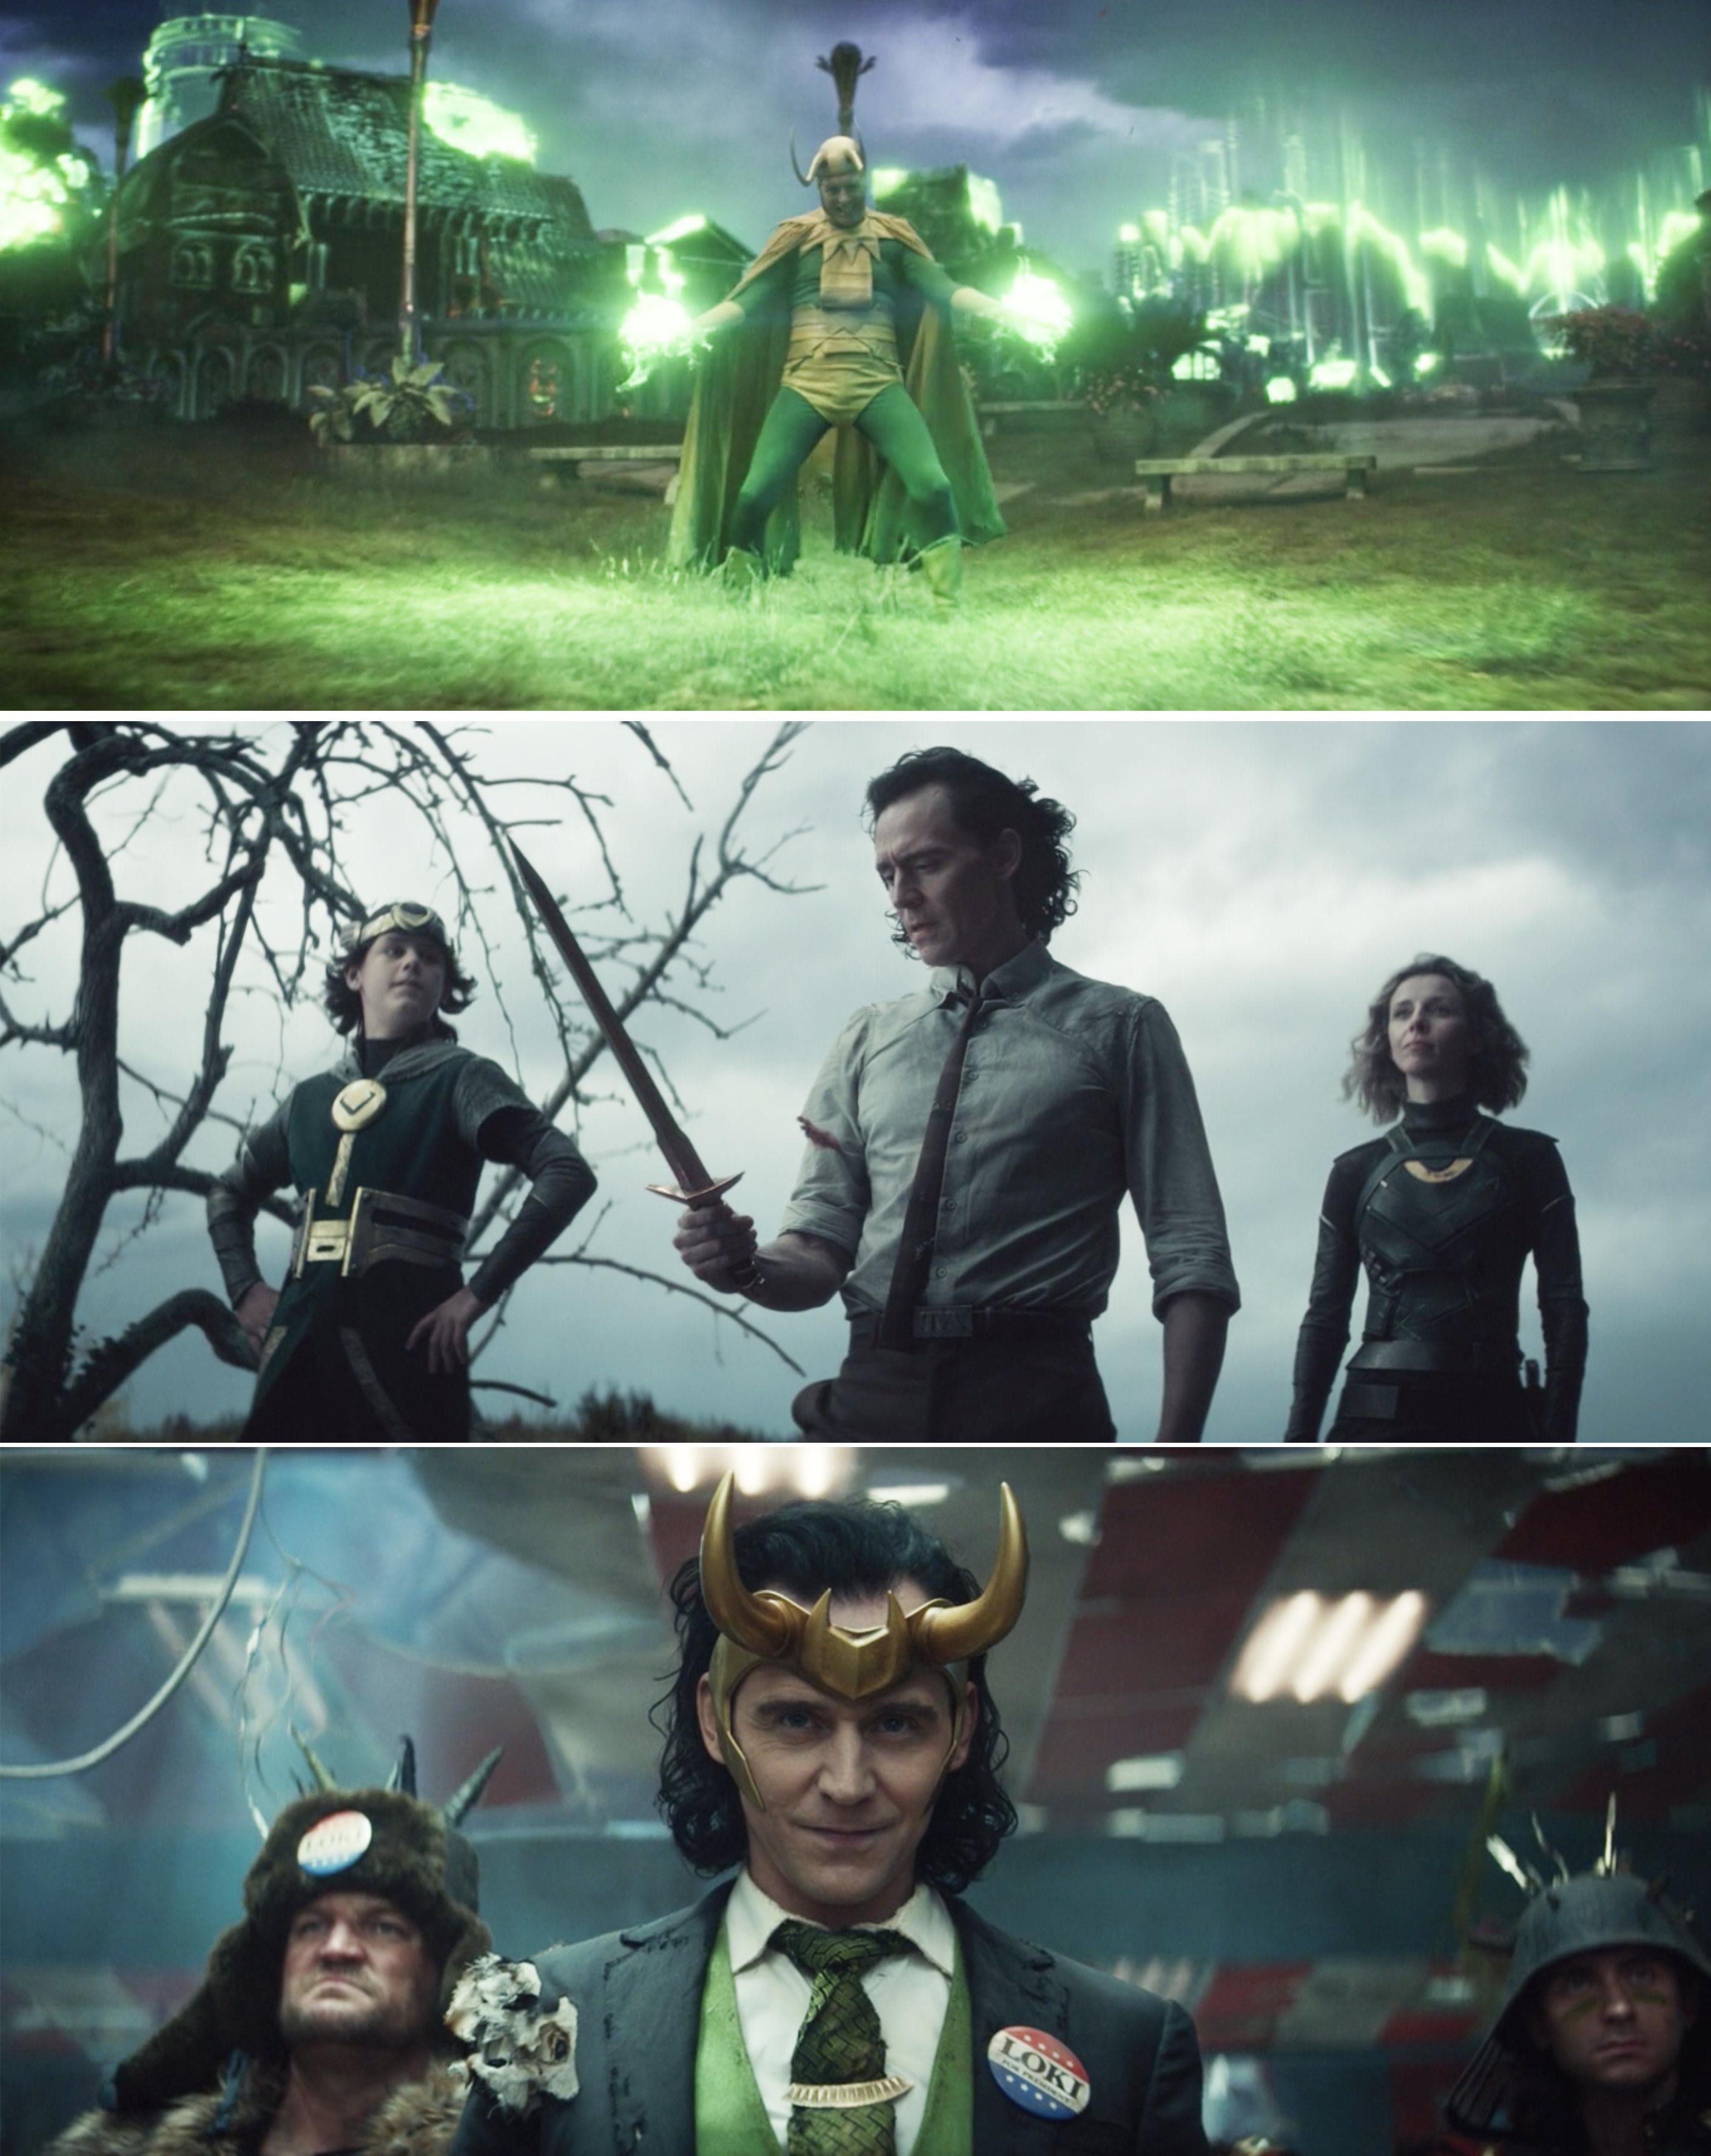 Classic Loki doing magic, Kid Loki giving Loki and sword, and President Loki